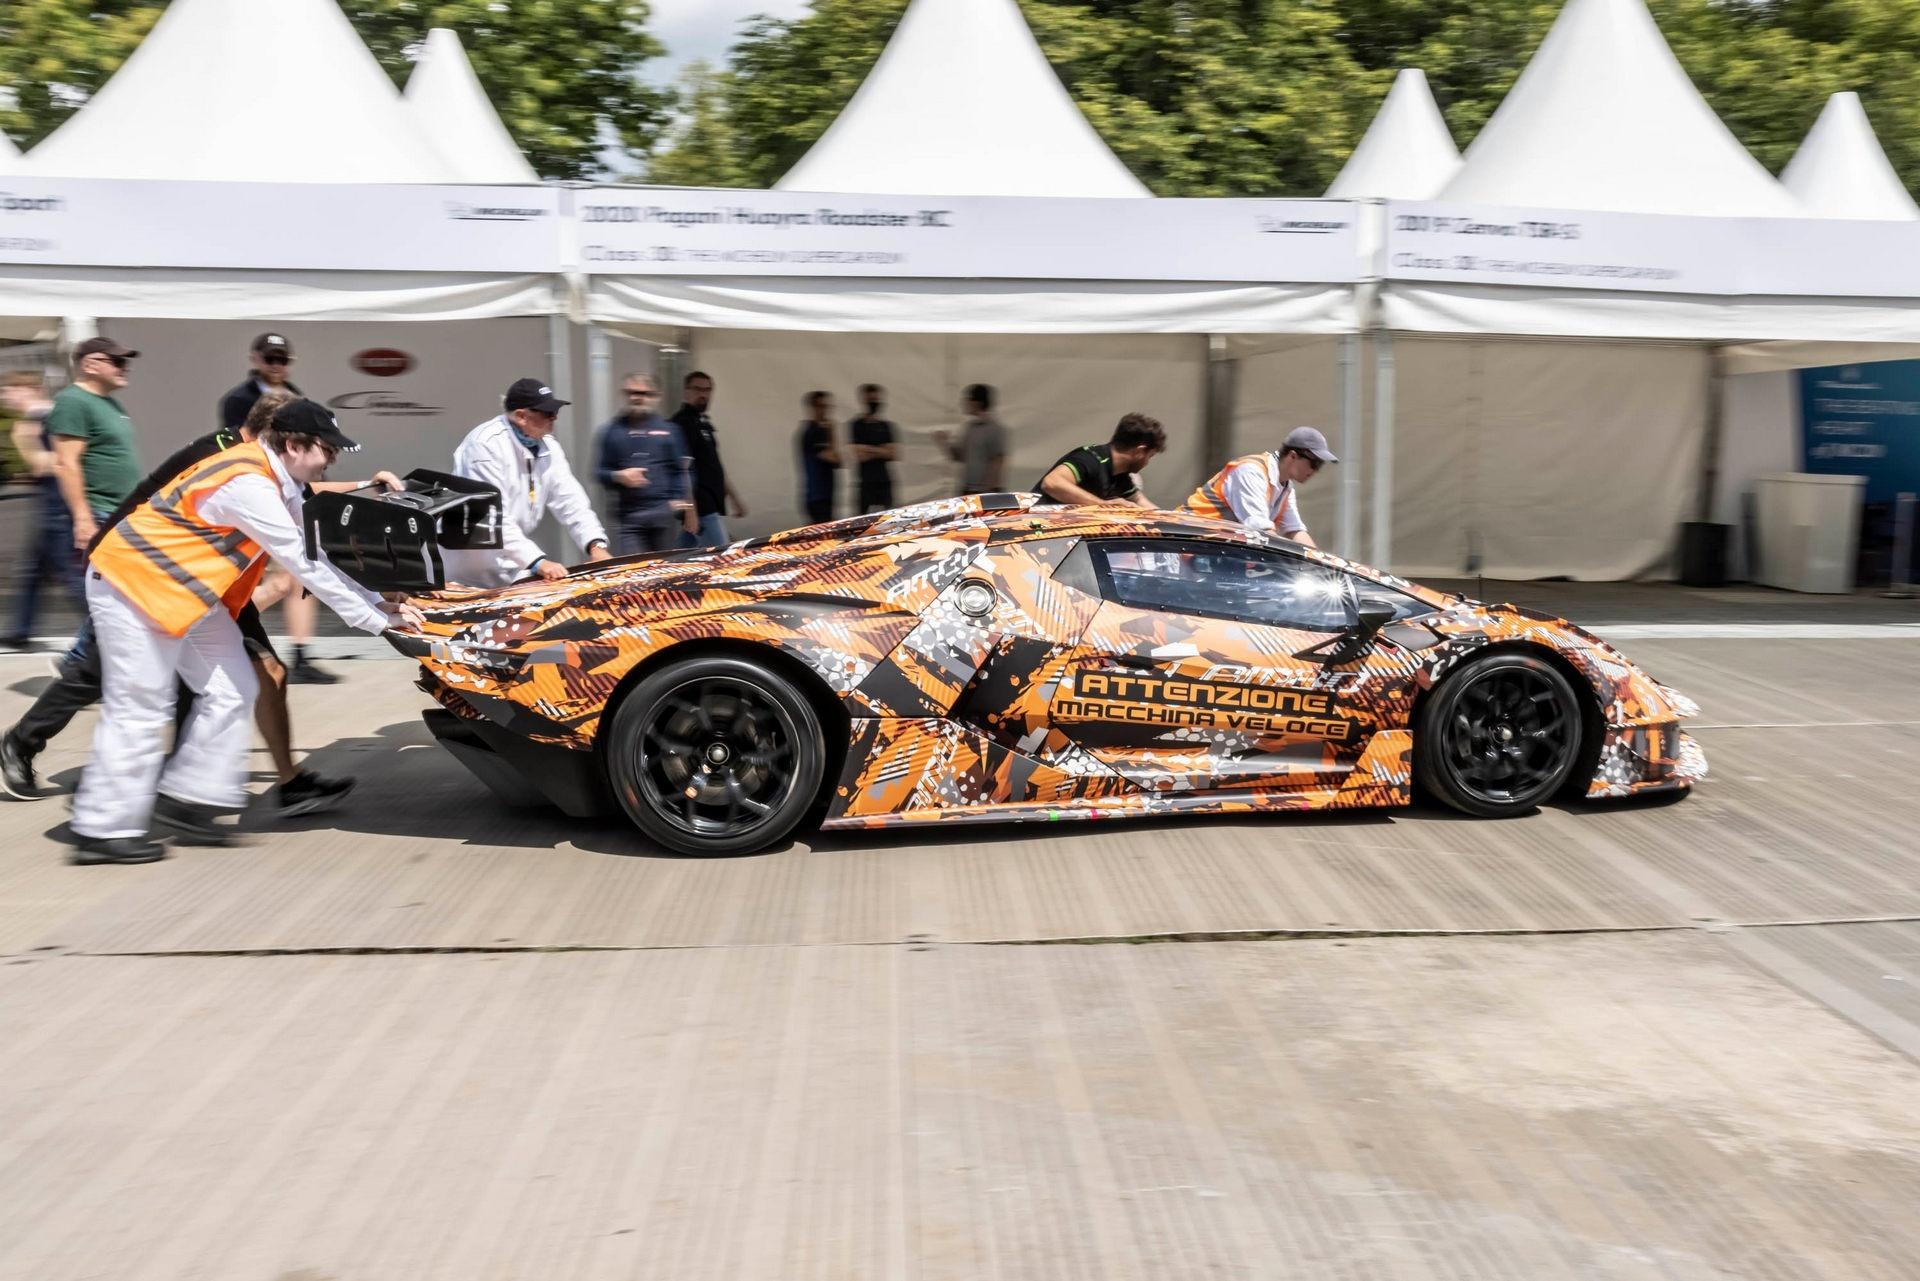 Nhung sieu xe noi bat tai Goodwood Festival of Speed 2021 anh 9